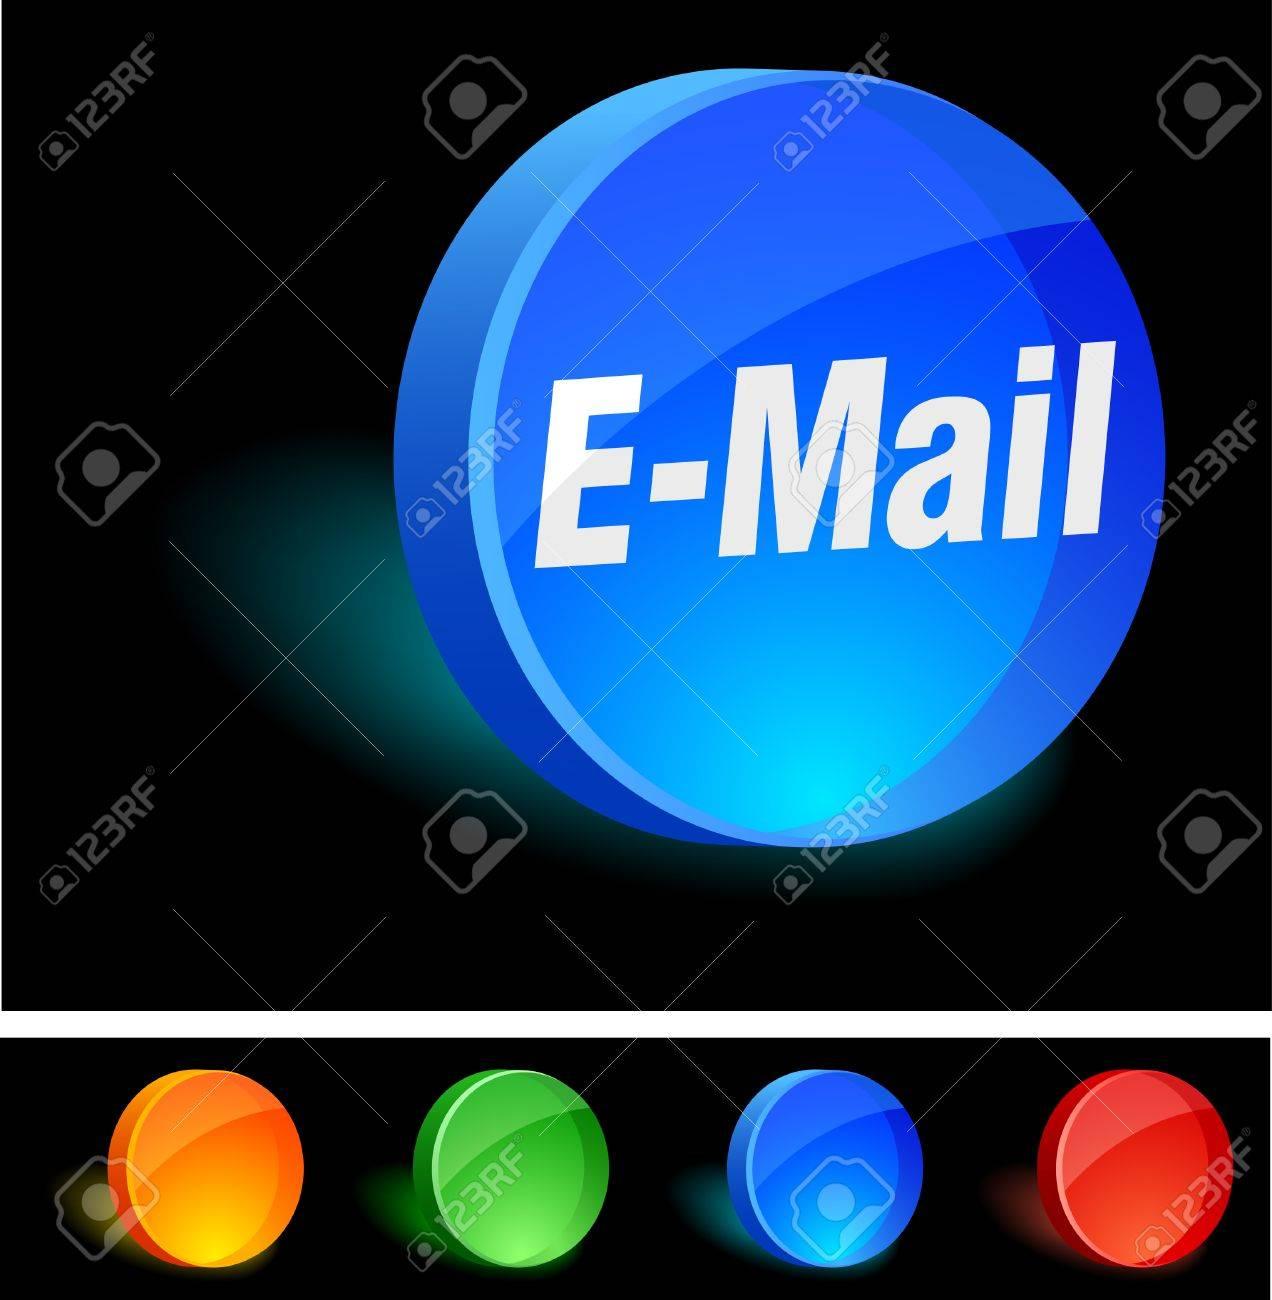 E-mail 3d icon. Vector illustration. Stock Vector - 5155105